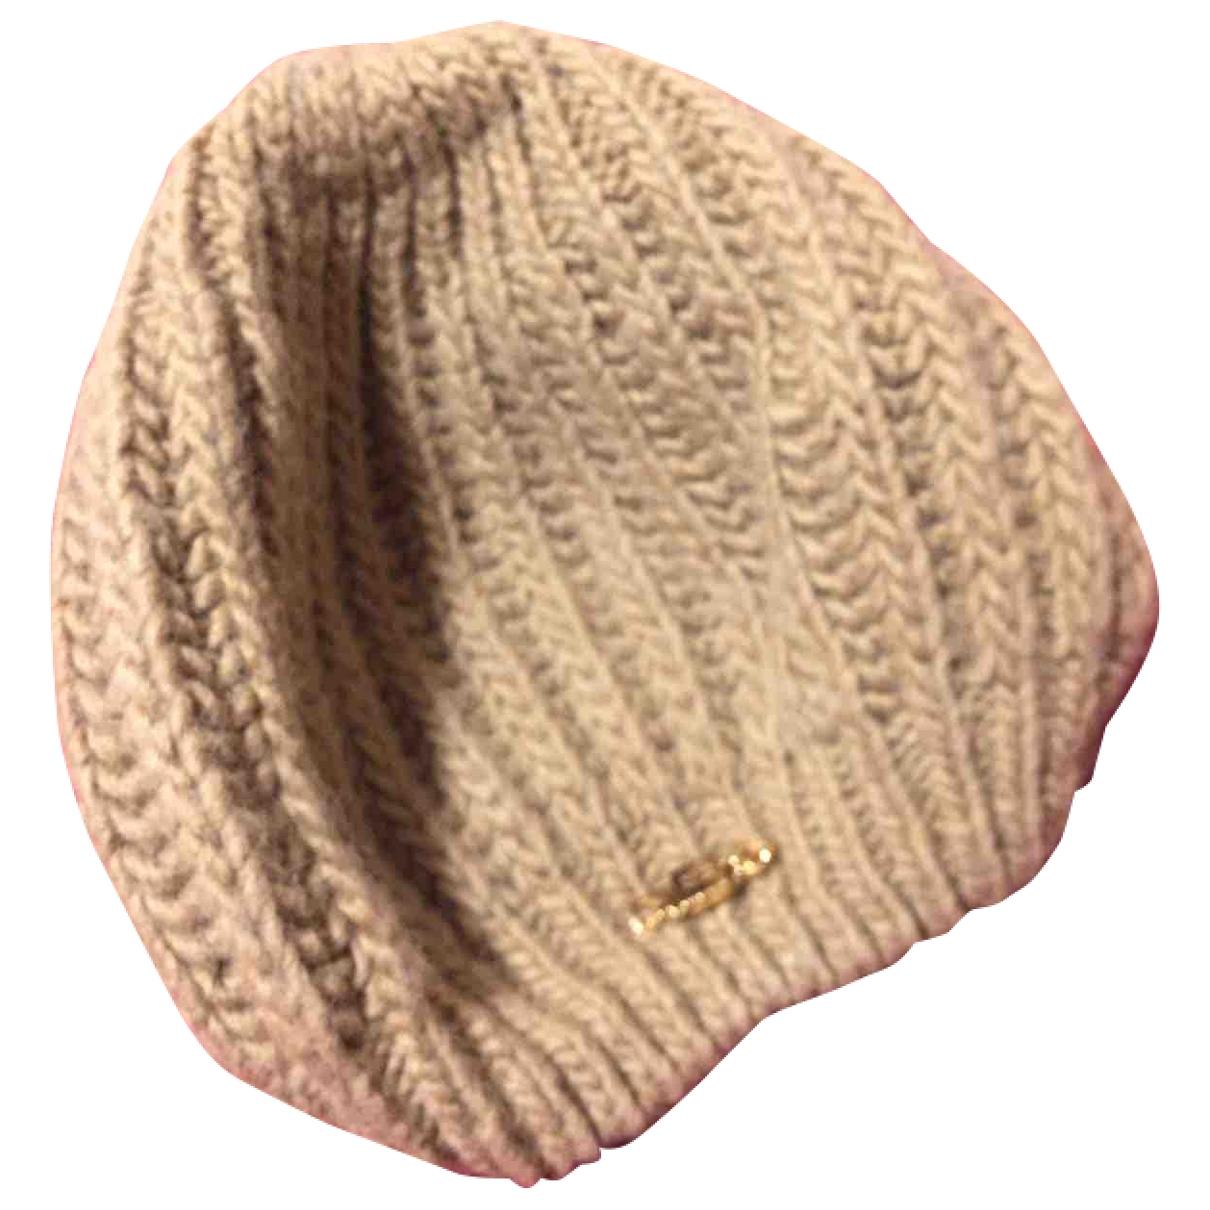 Elisabetta Franchi \N Beige Wool hat for Women 21.2 Inches